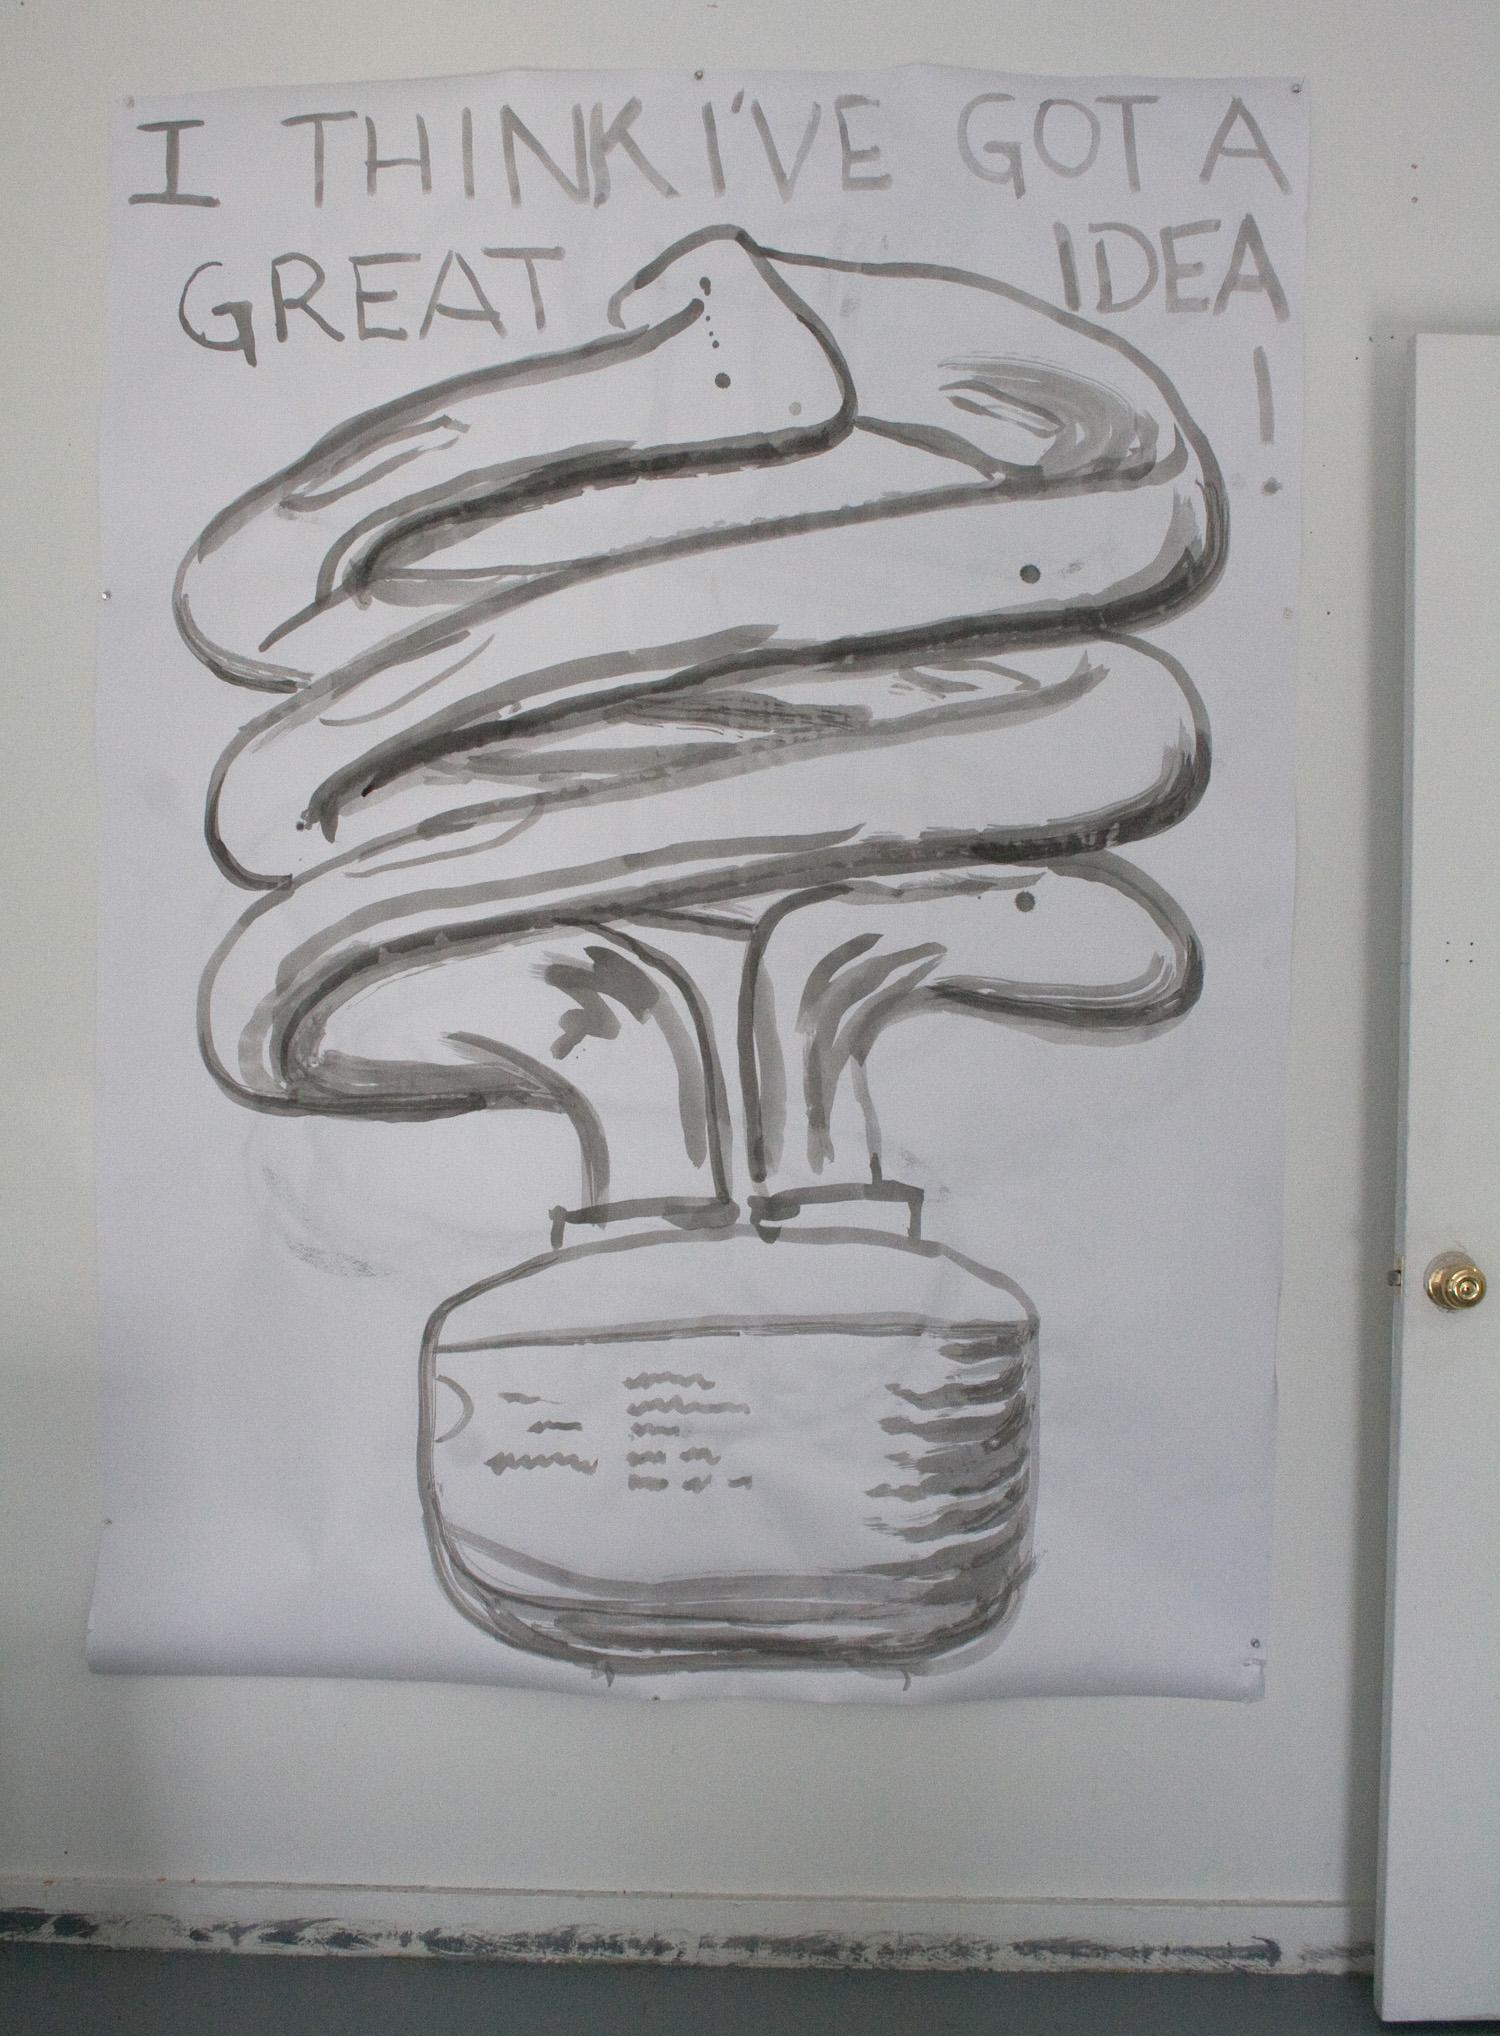 I Think I've Got a Great Idea!